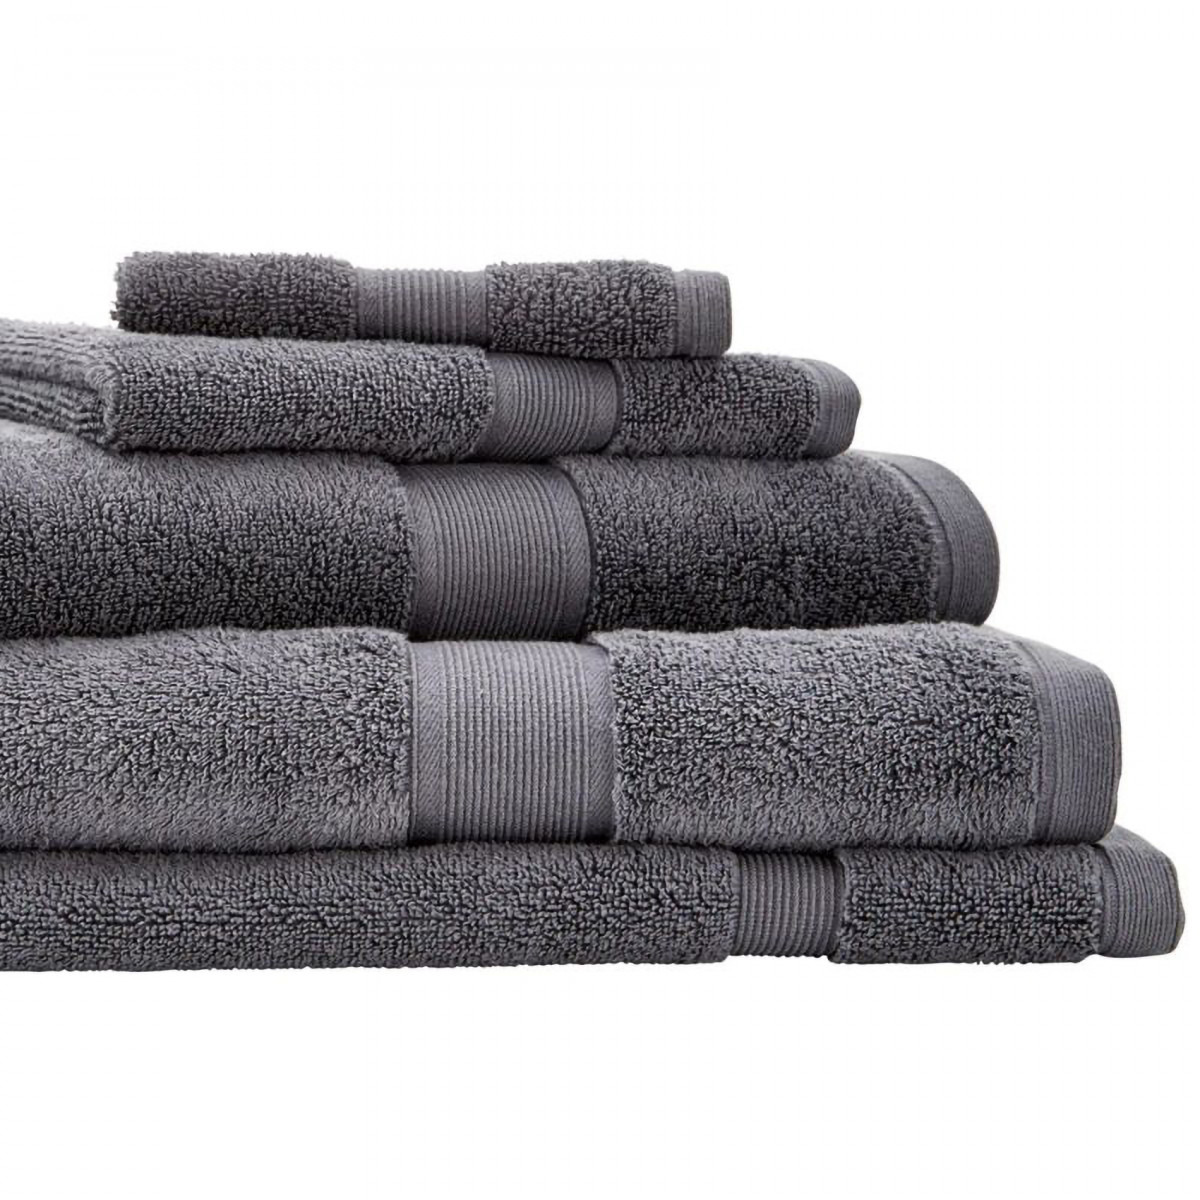 SHERIDAN 超轻豪华毛巾系列